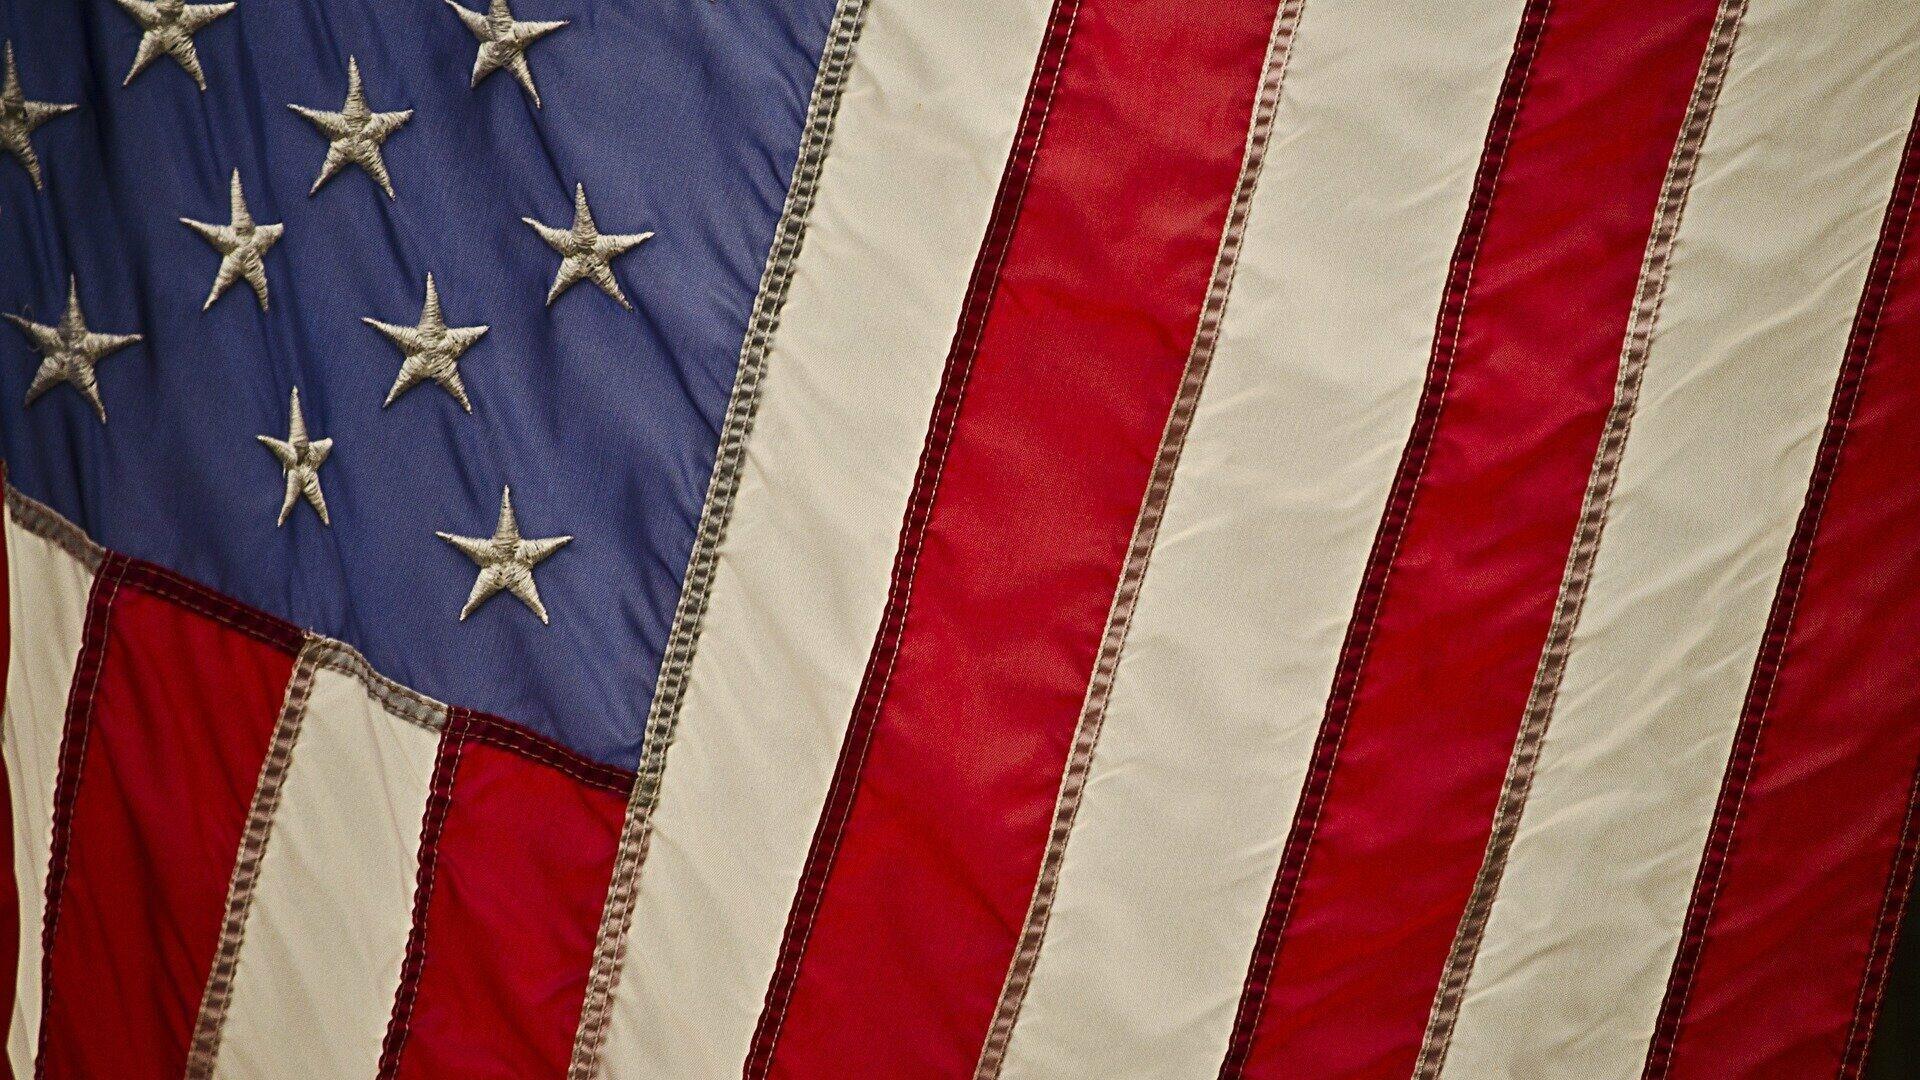 Bandera de EEUU - Sputnik Mundo, 1920, 08.04.2021